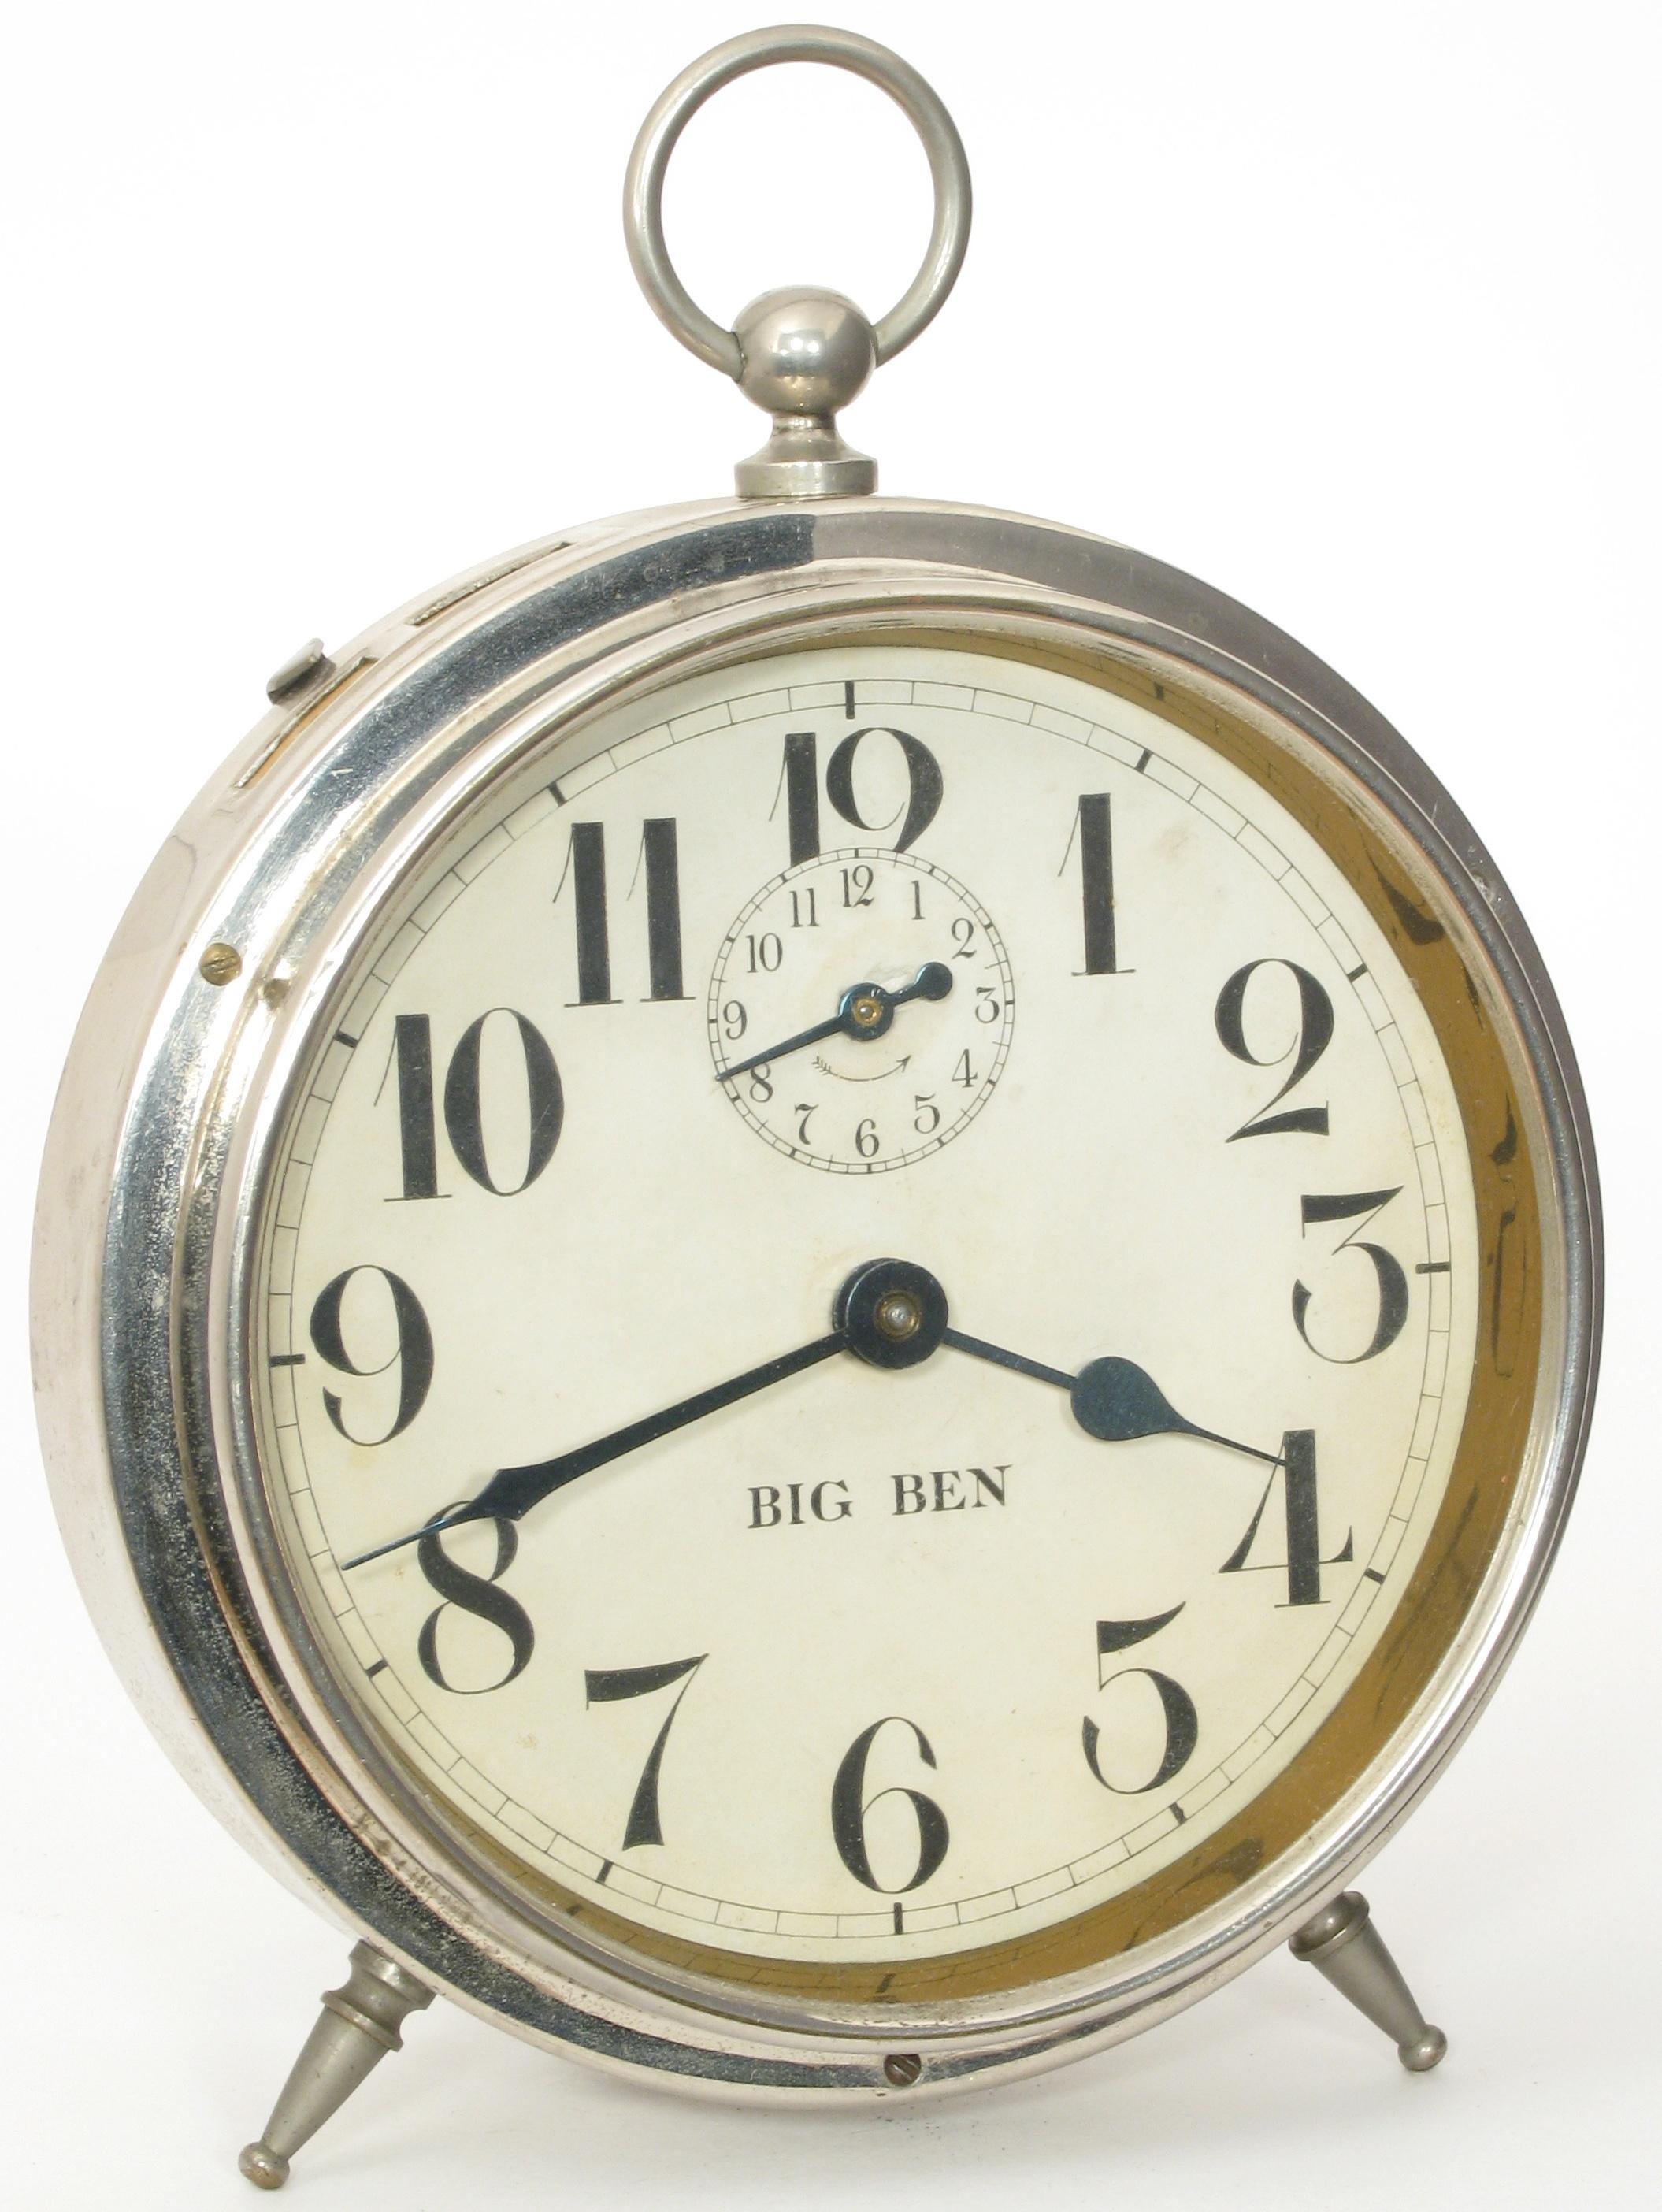 Winding Keys On Westclox Big Ben Leg Model Alarm Clocks Clockinfo